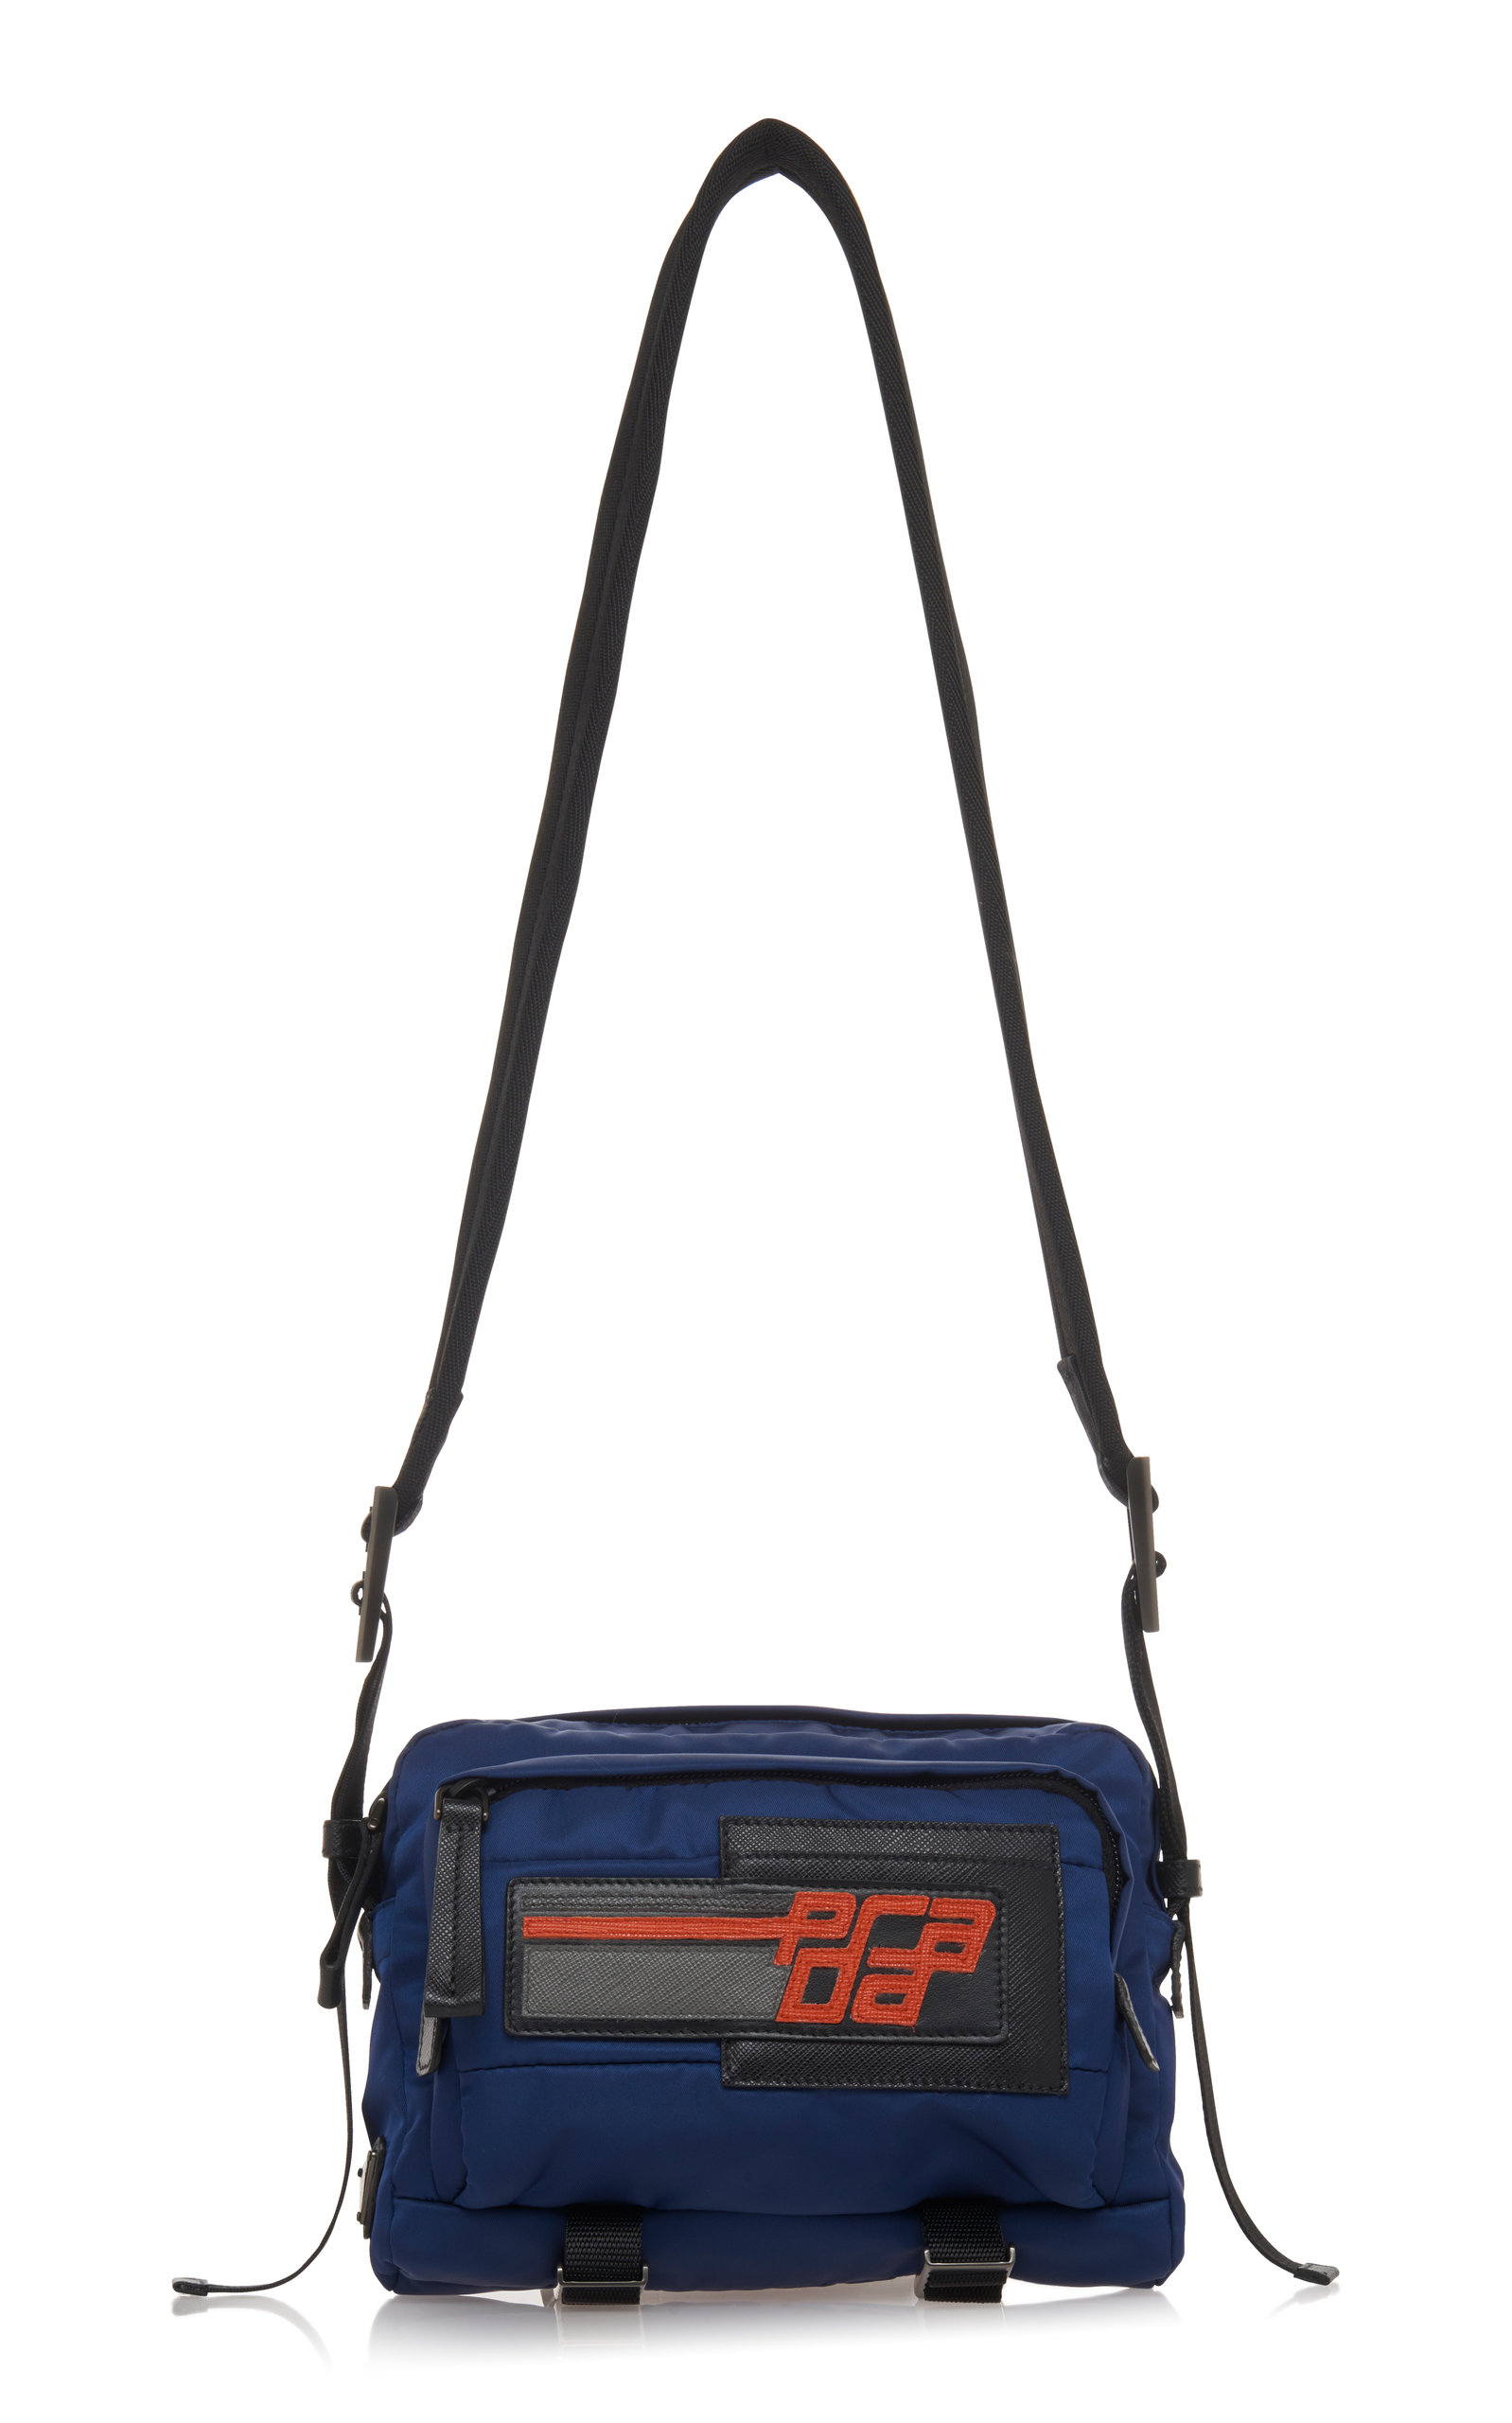 9bf926954331 Blue Nylon Quilted Camera Bag by Prada | Moda Operandi